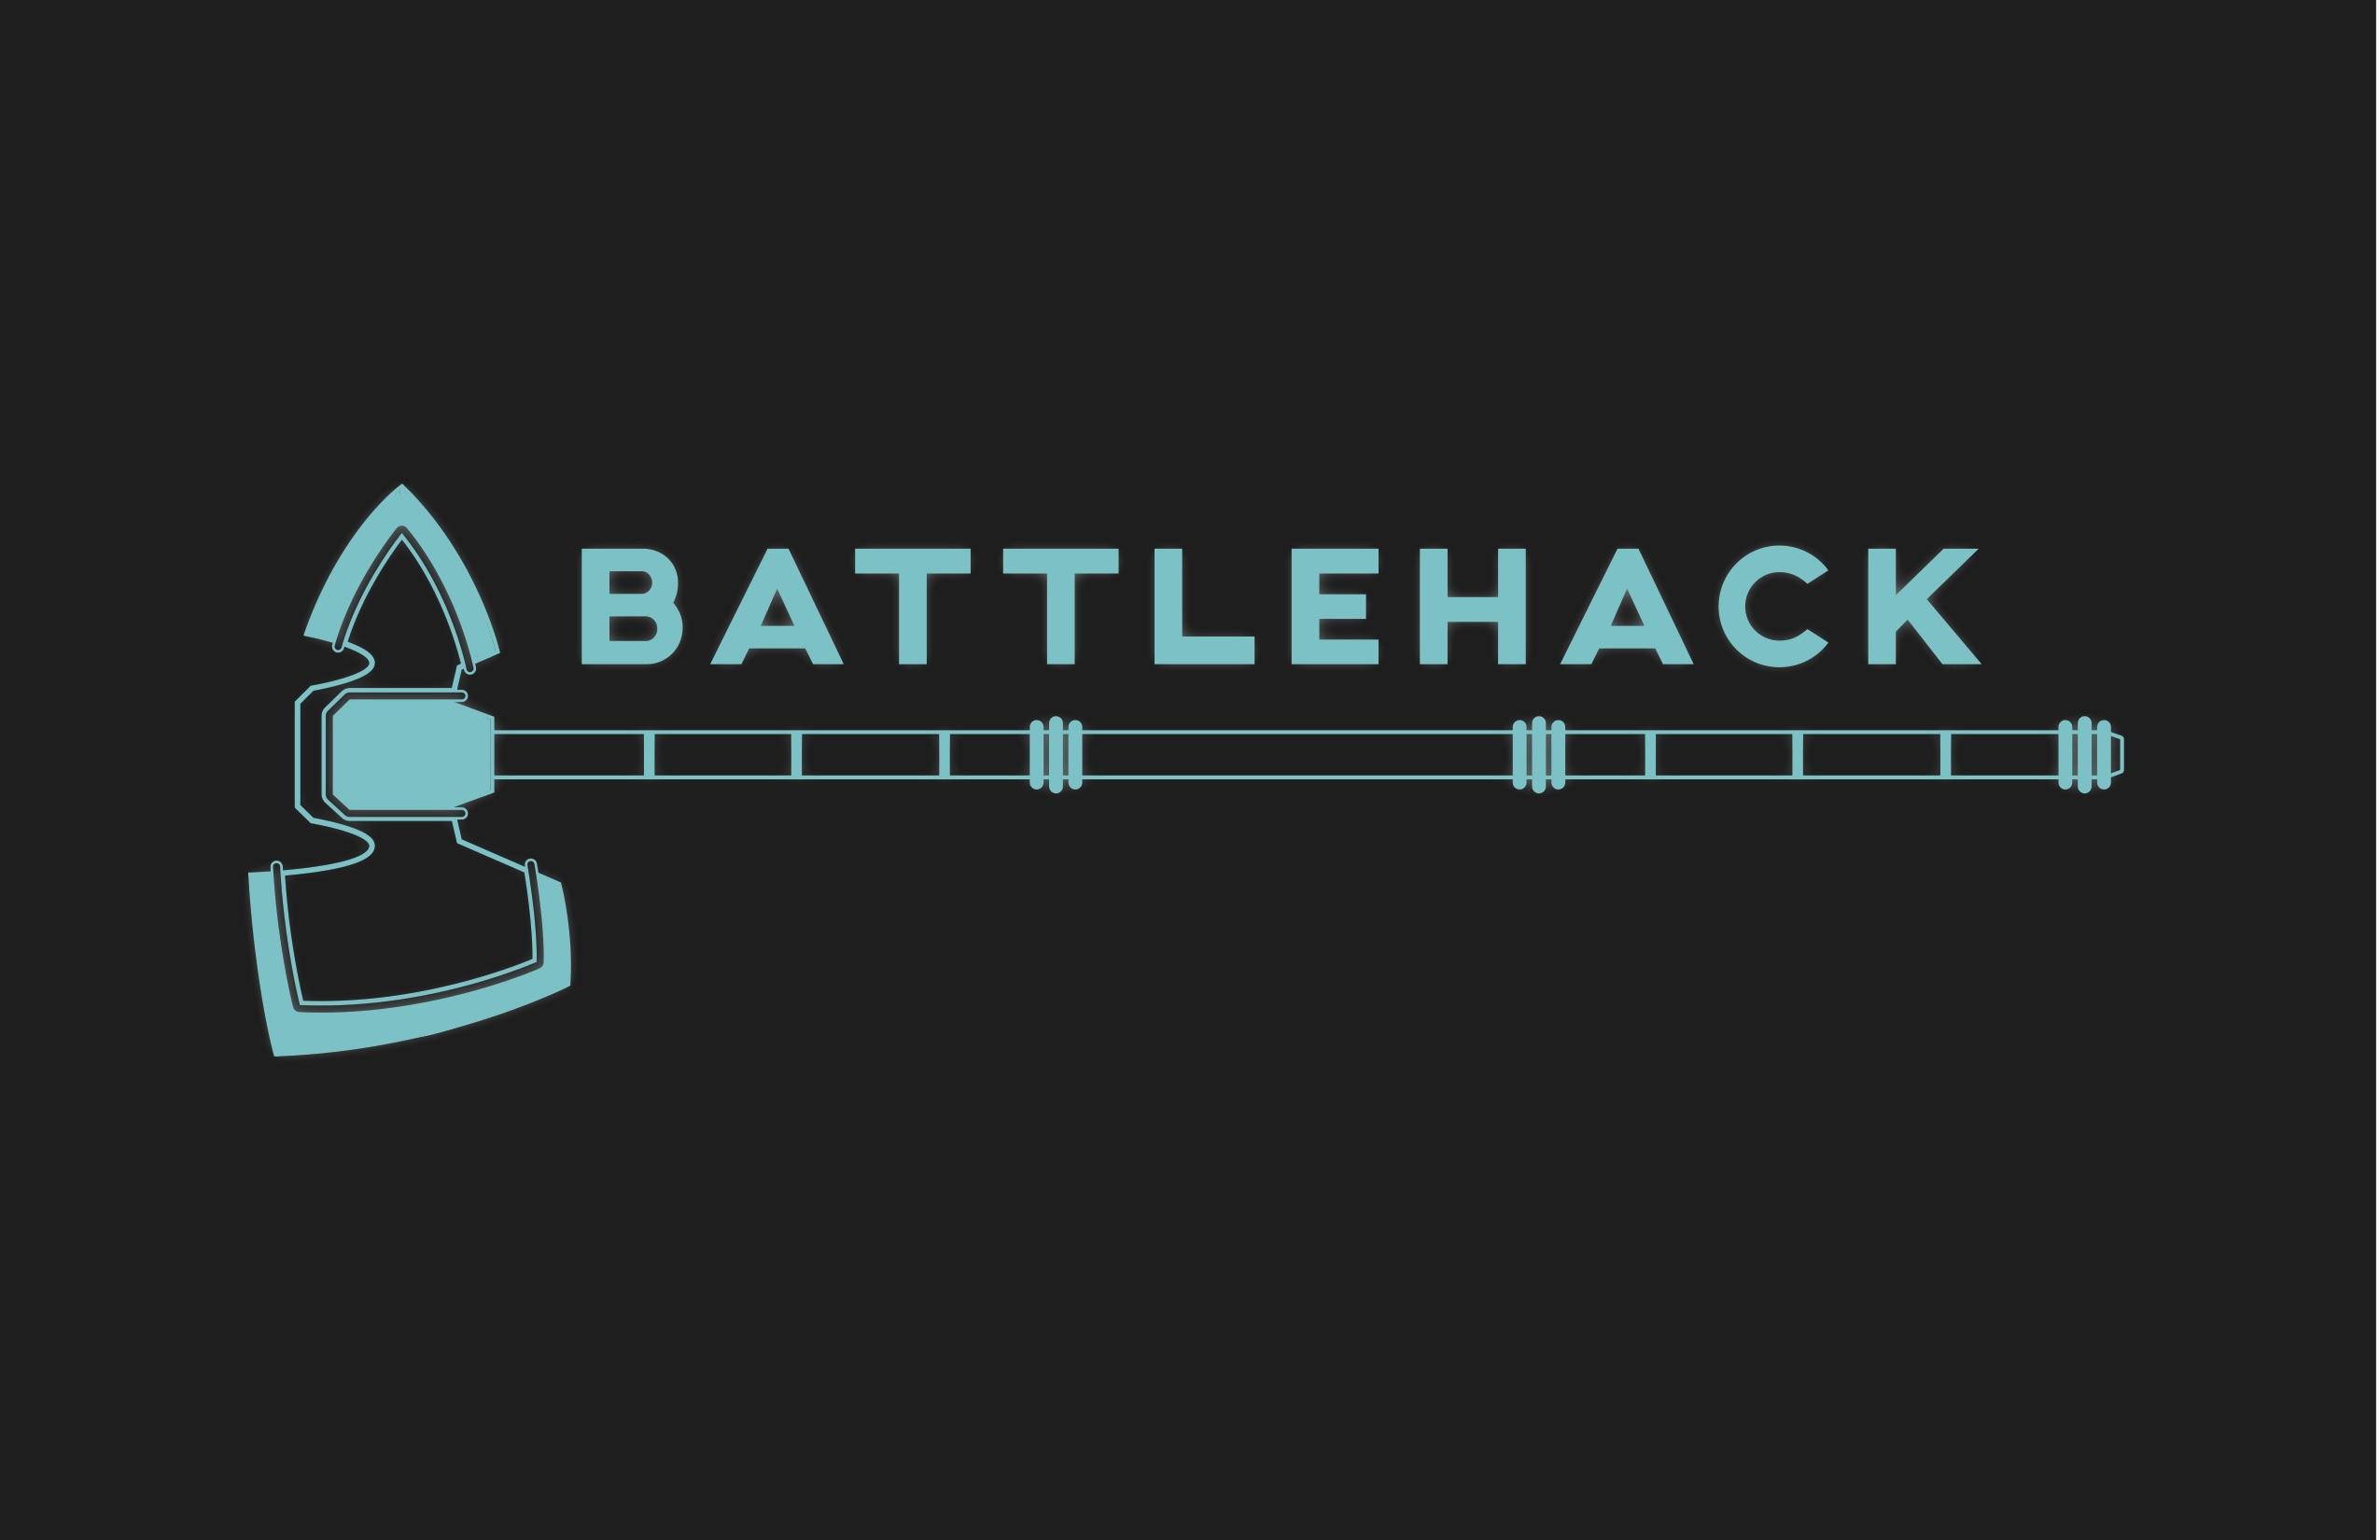 BattleHack New York City